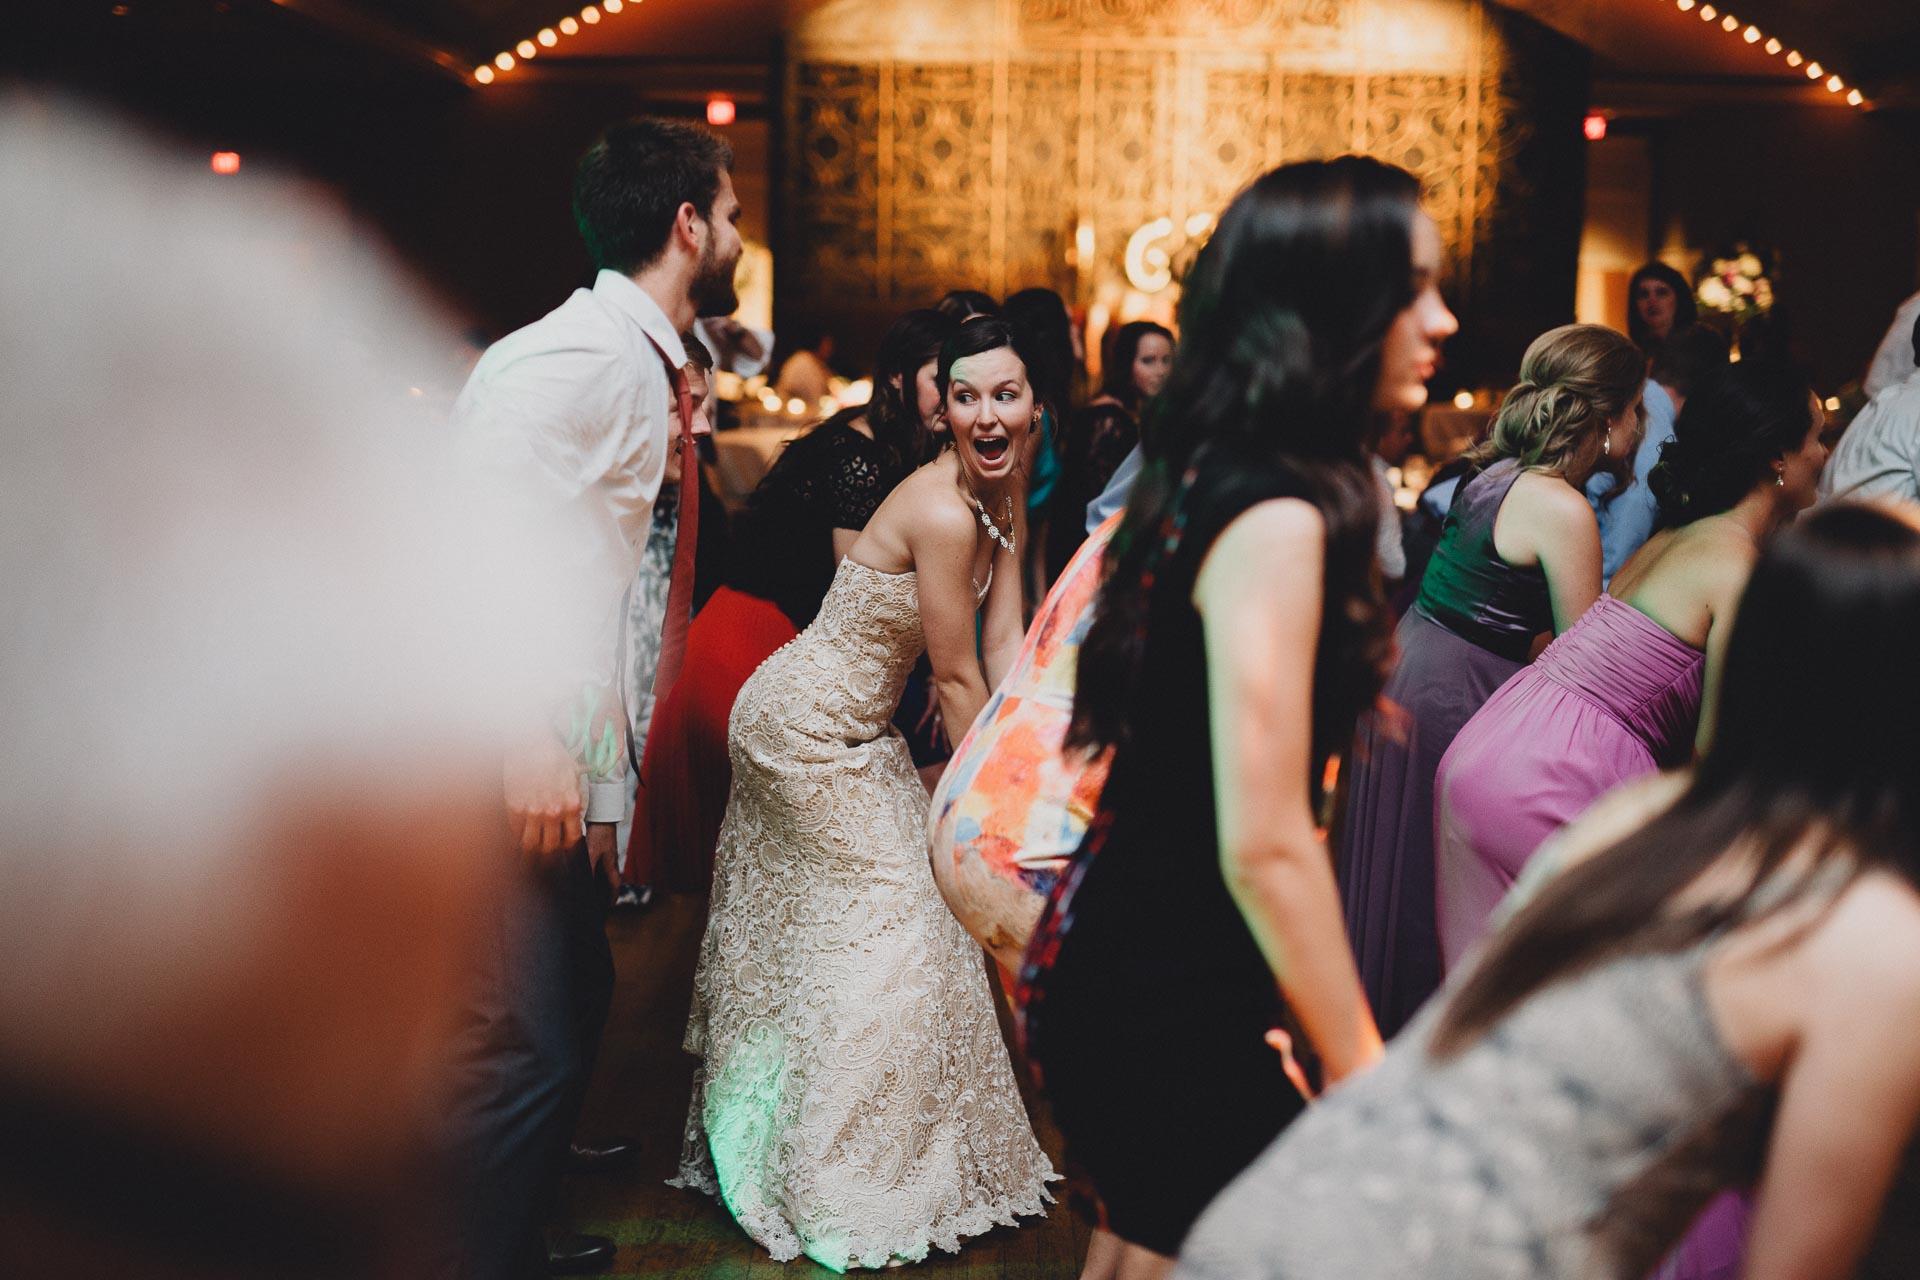 Julia-Michael-Cincinnati-Music-Hall-Wedding-141@2x.jpg